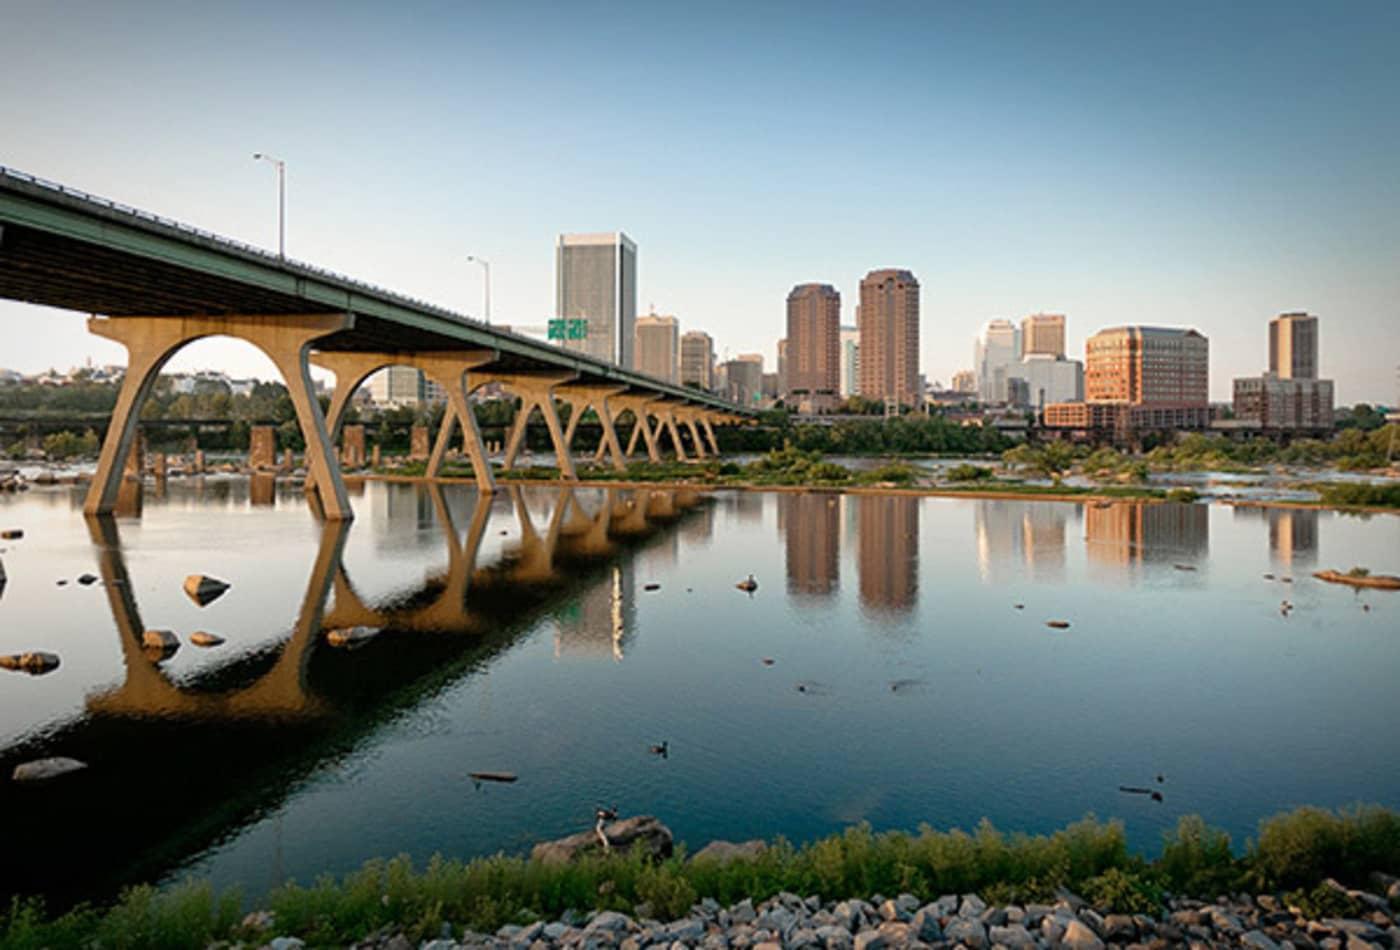 10-emptiest-us-cities-2012-richmond.jpg